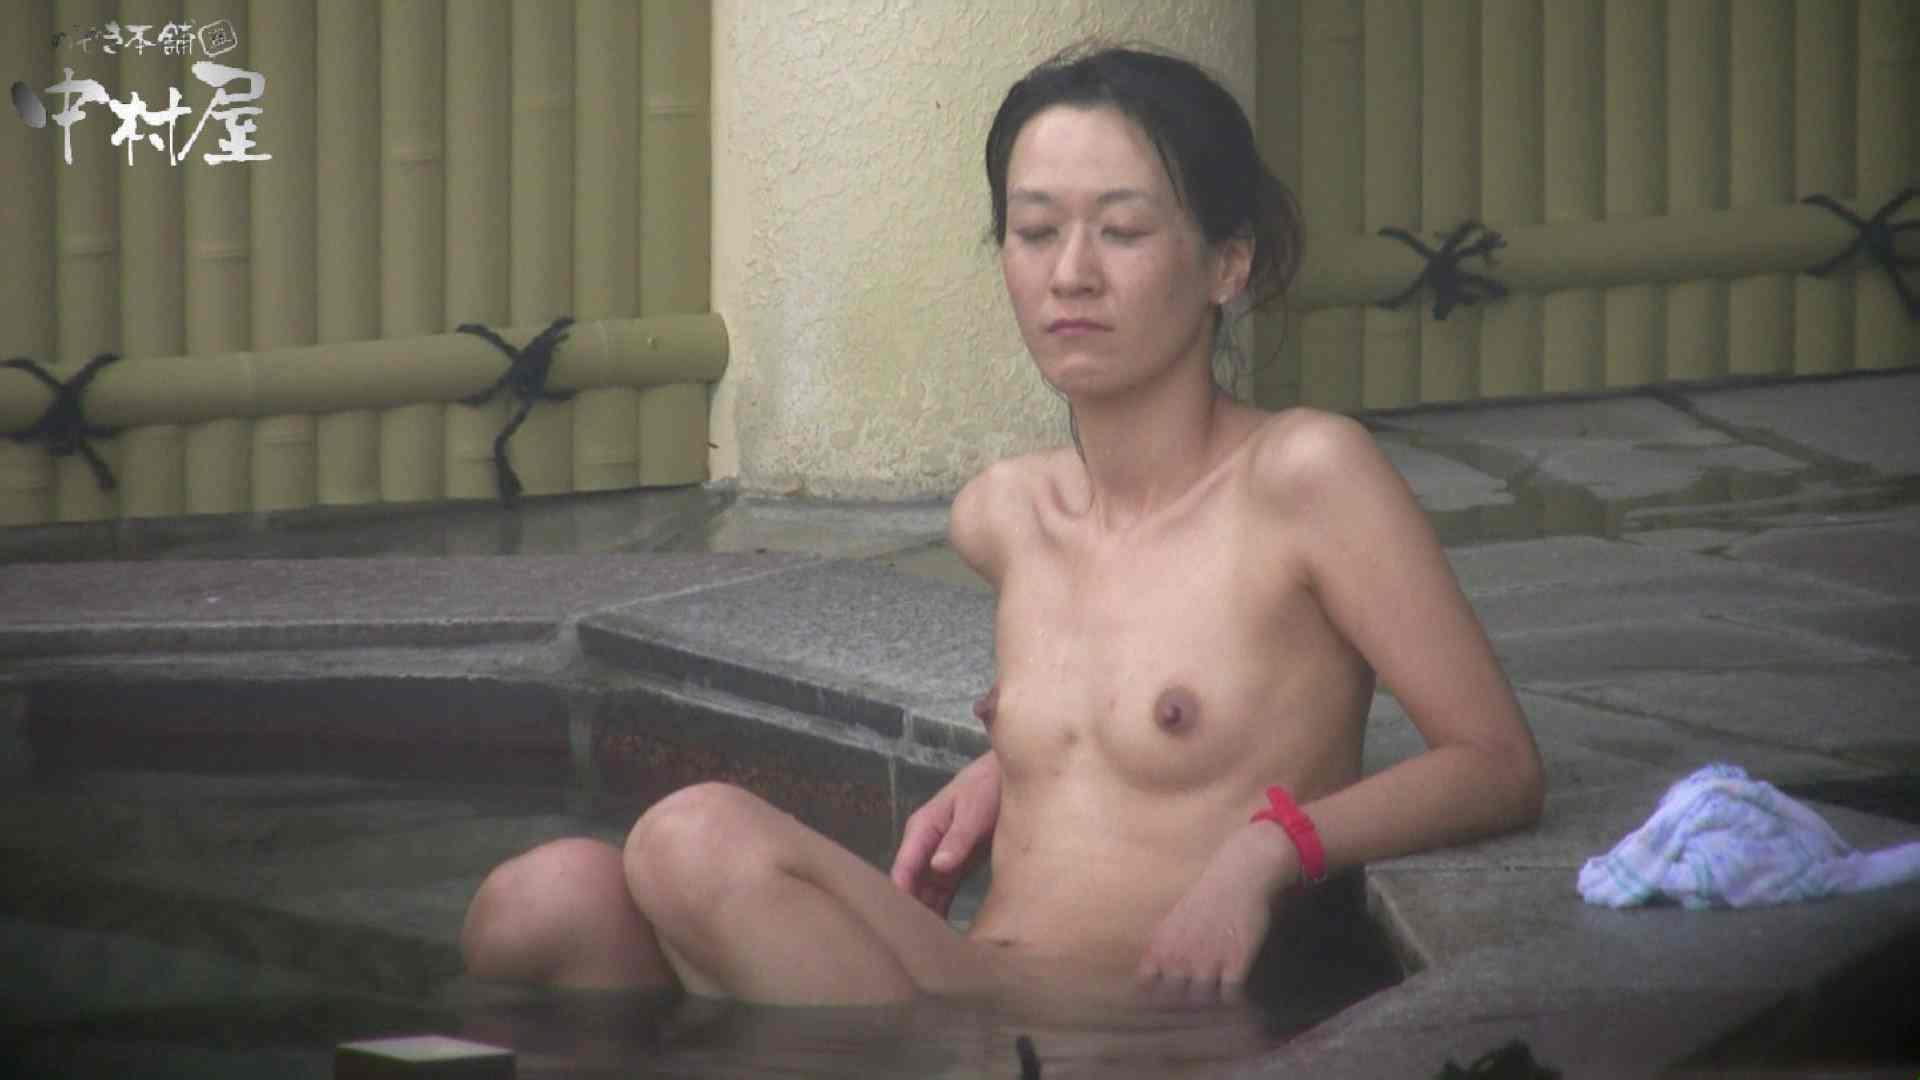 Aquaな露天風呂Vol.928 OLセックス | 盗撮  99画像 94